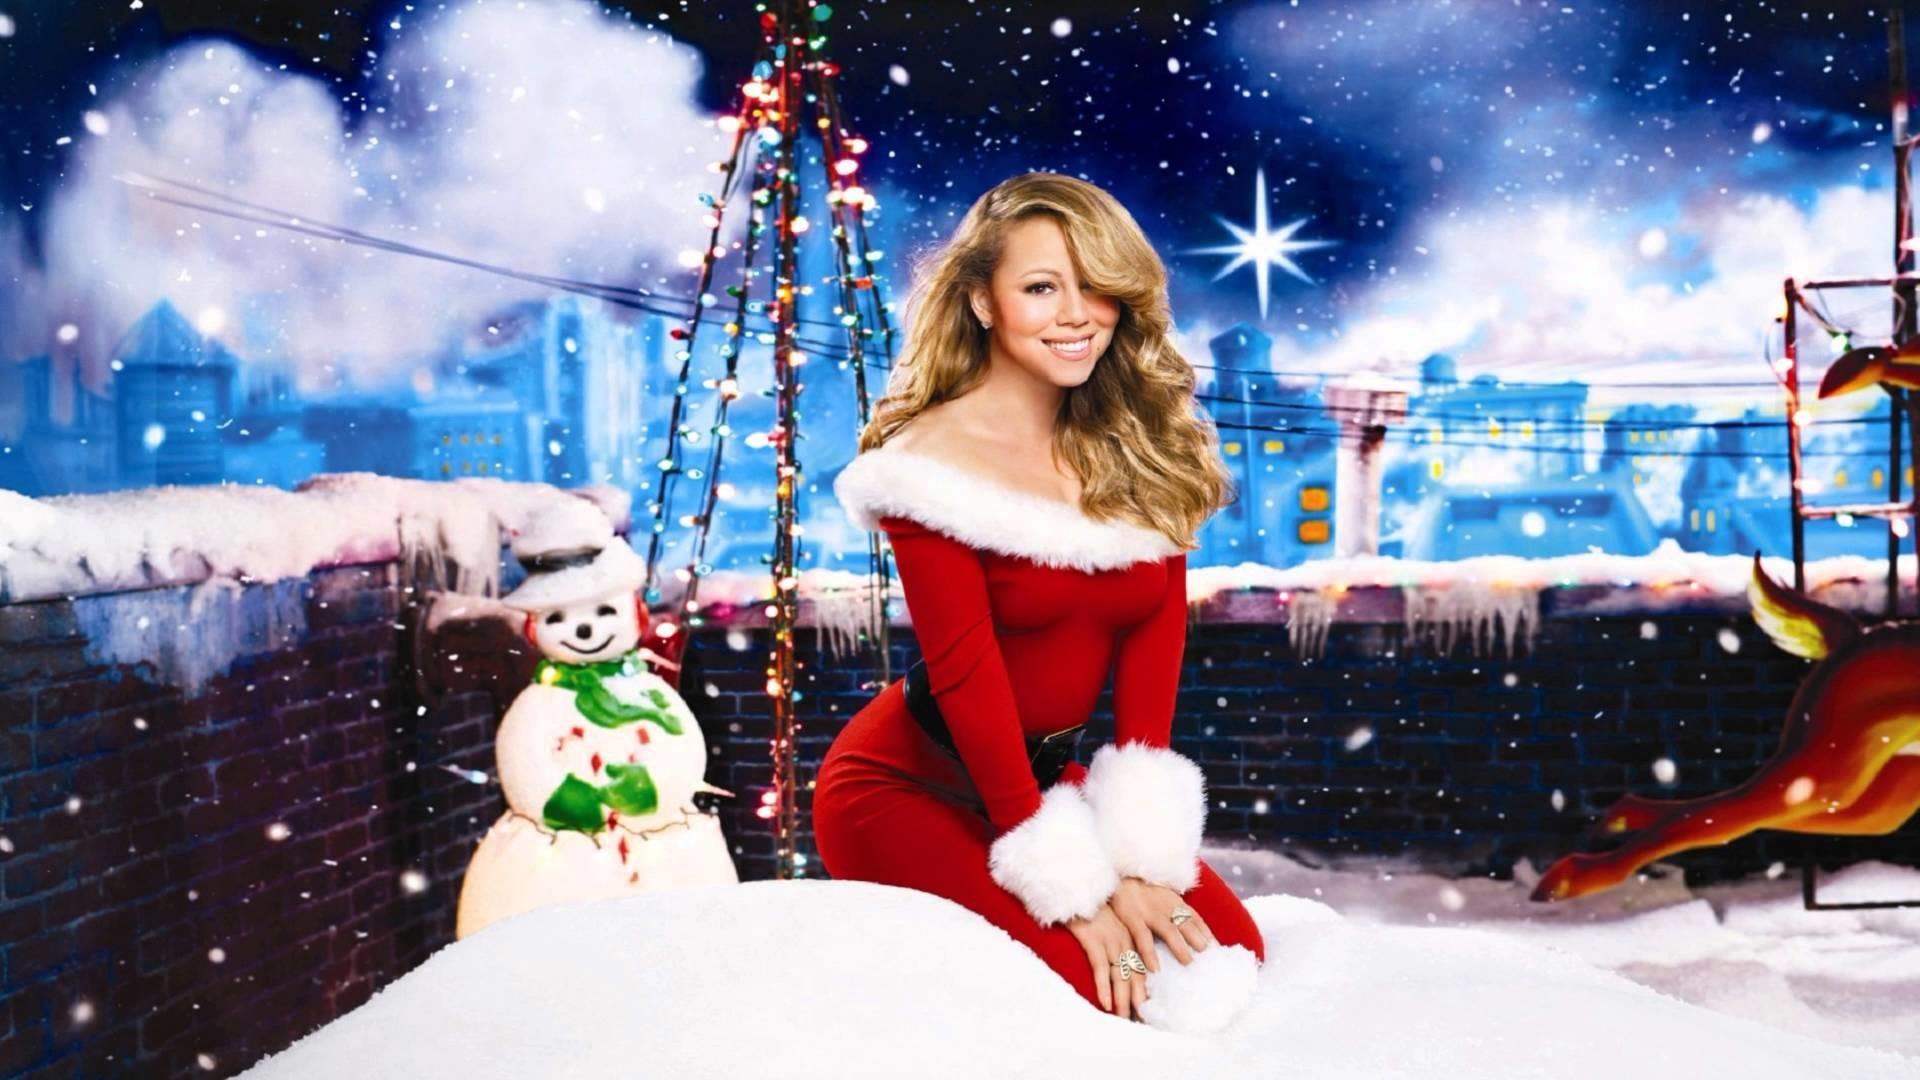 Mariah Carey Wallpapers (50+ images)